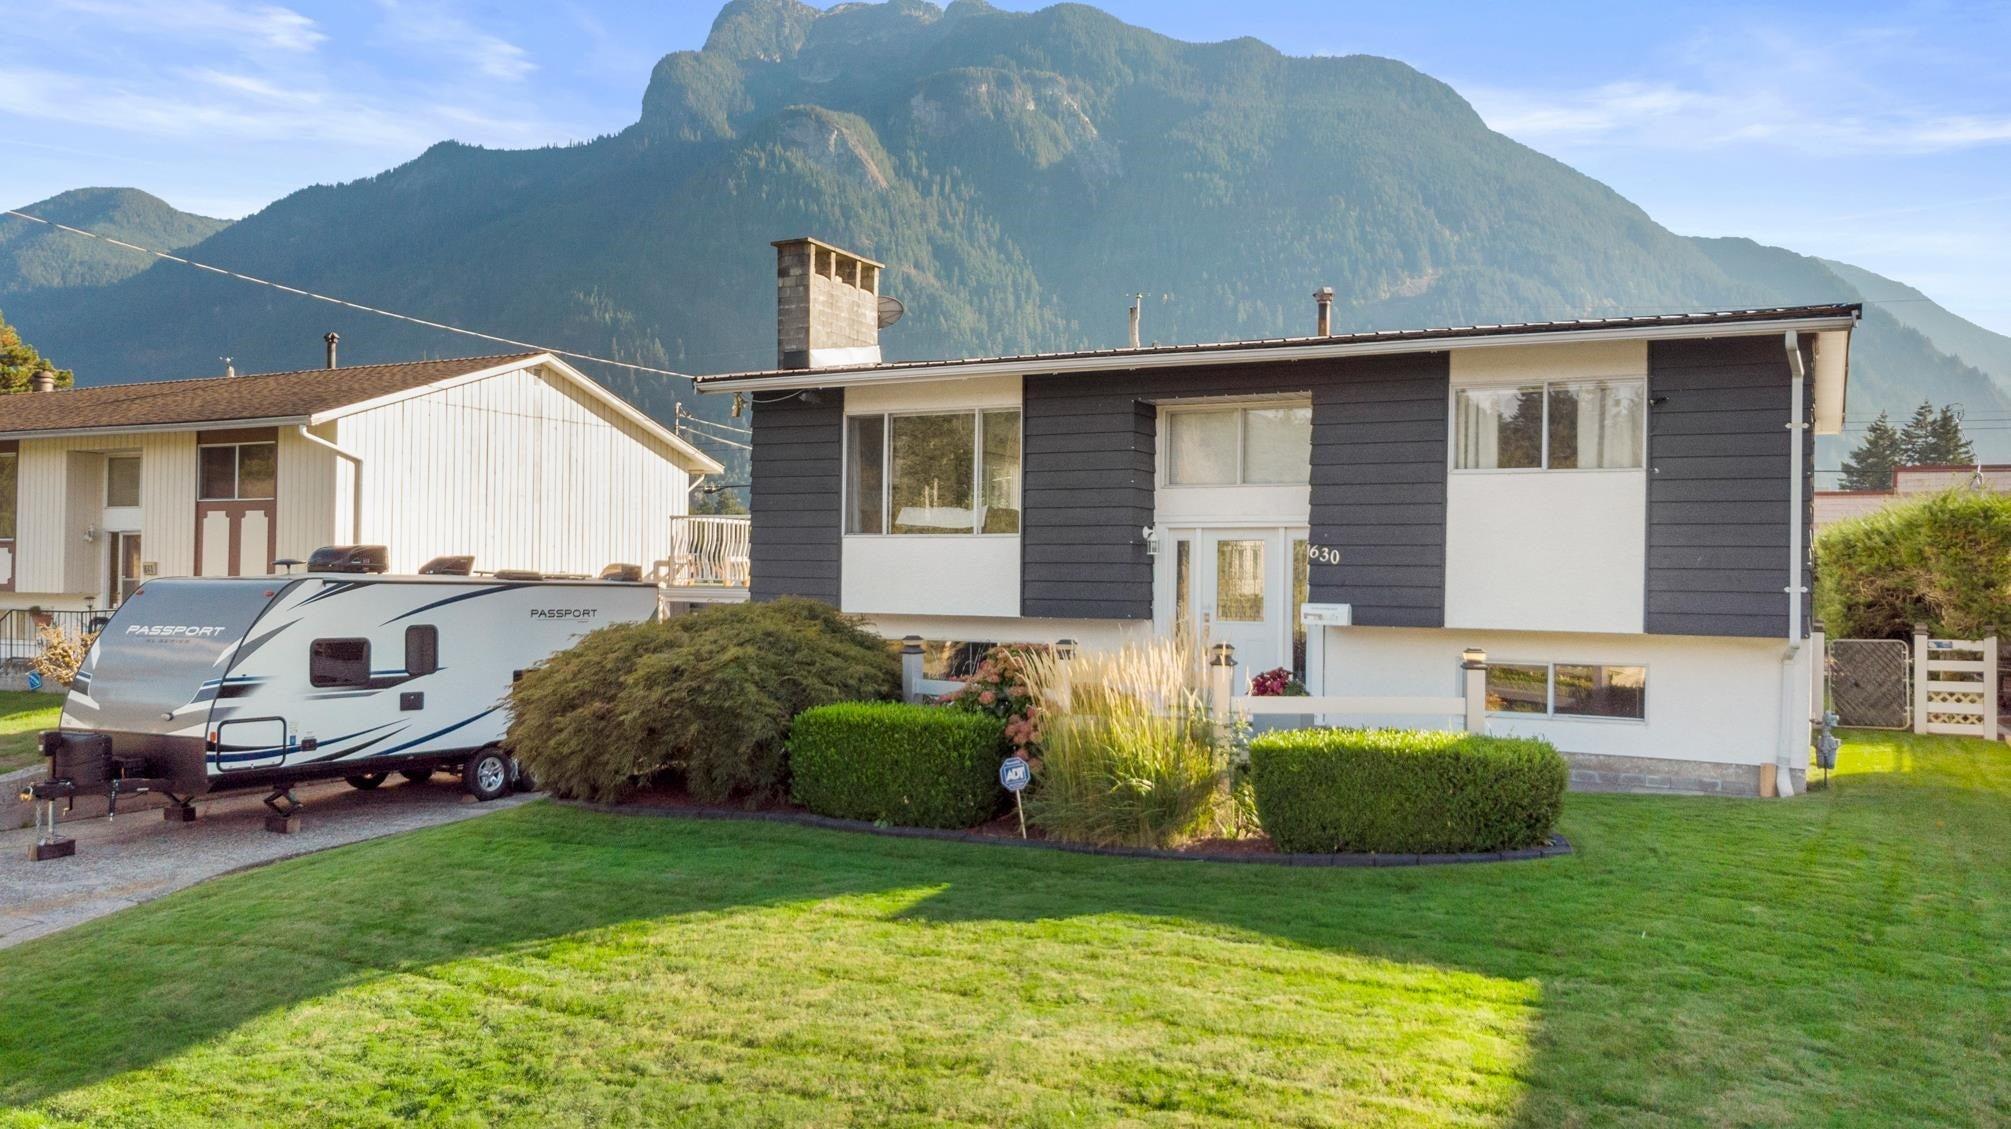 630 THACKER AVENUE - Hope Center House/Single Family for sale, 3 Bedrooms (R2622239) - #1